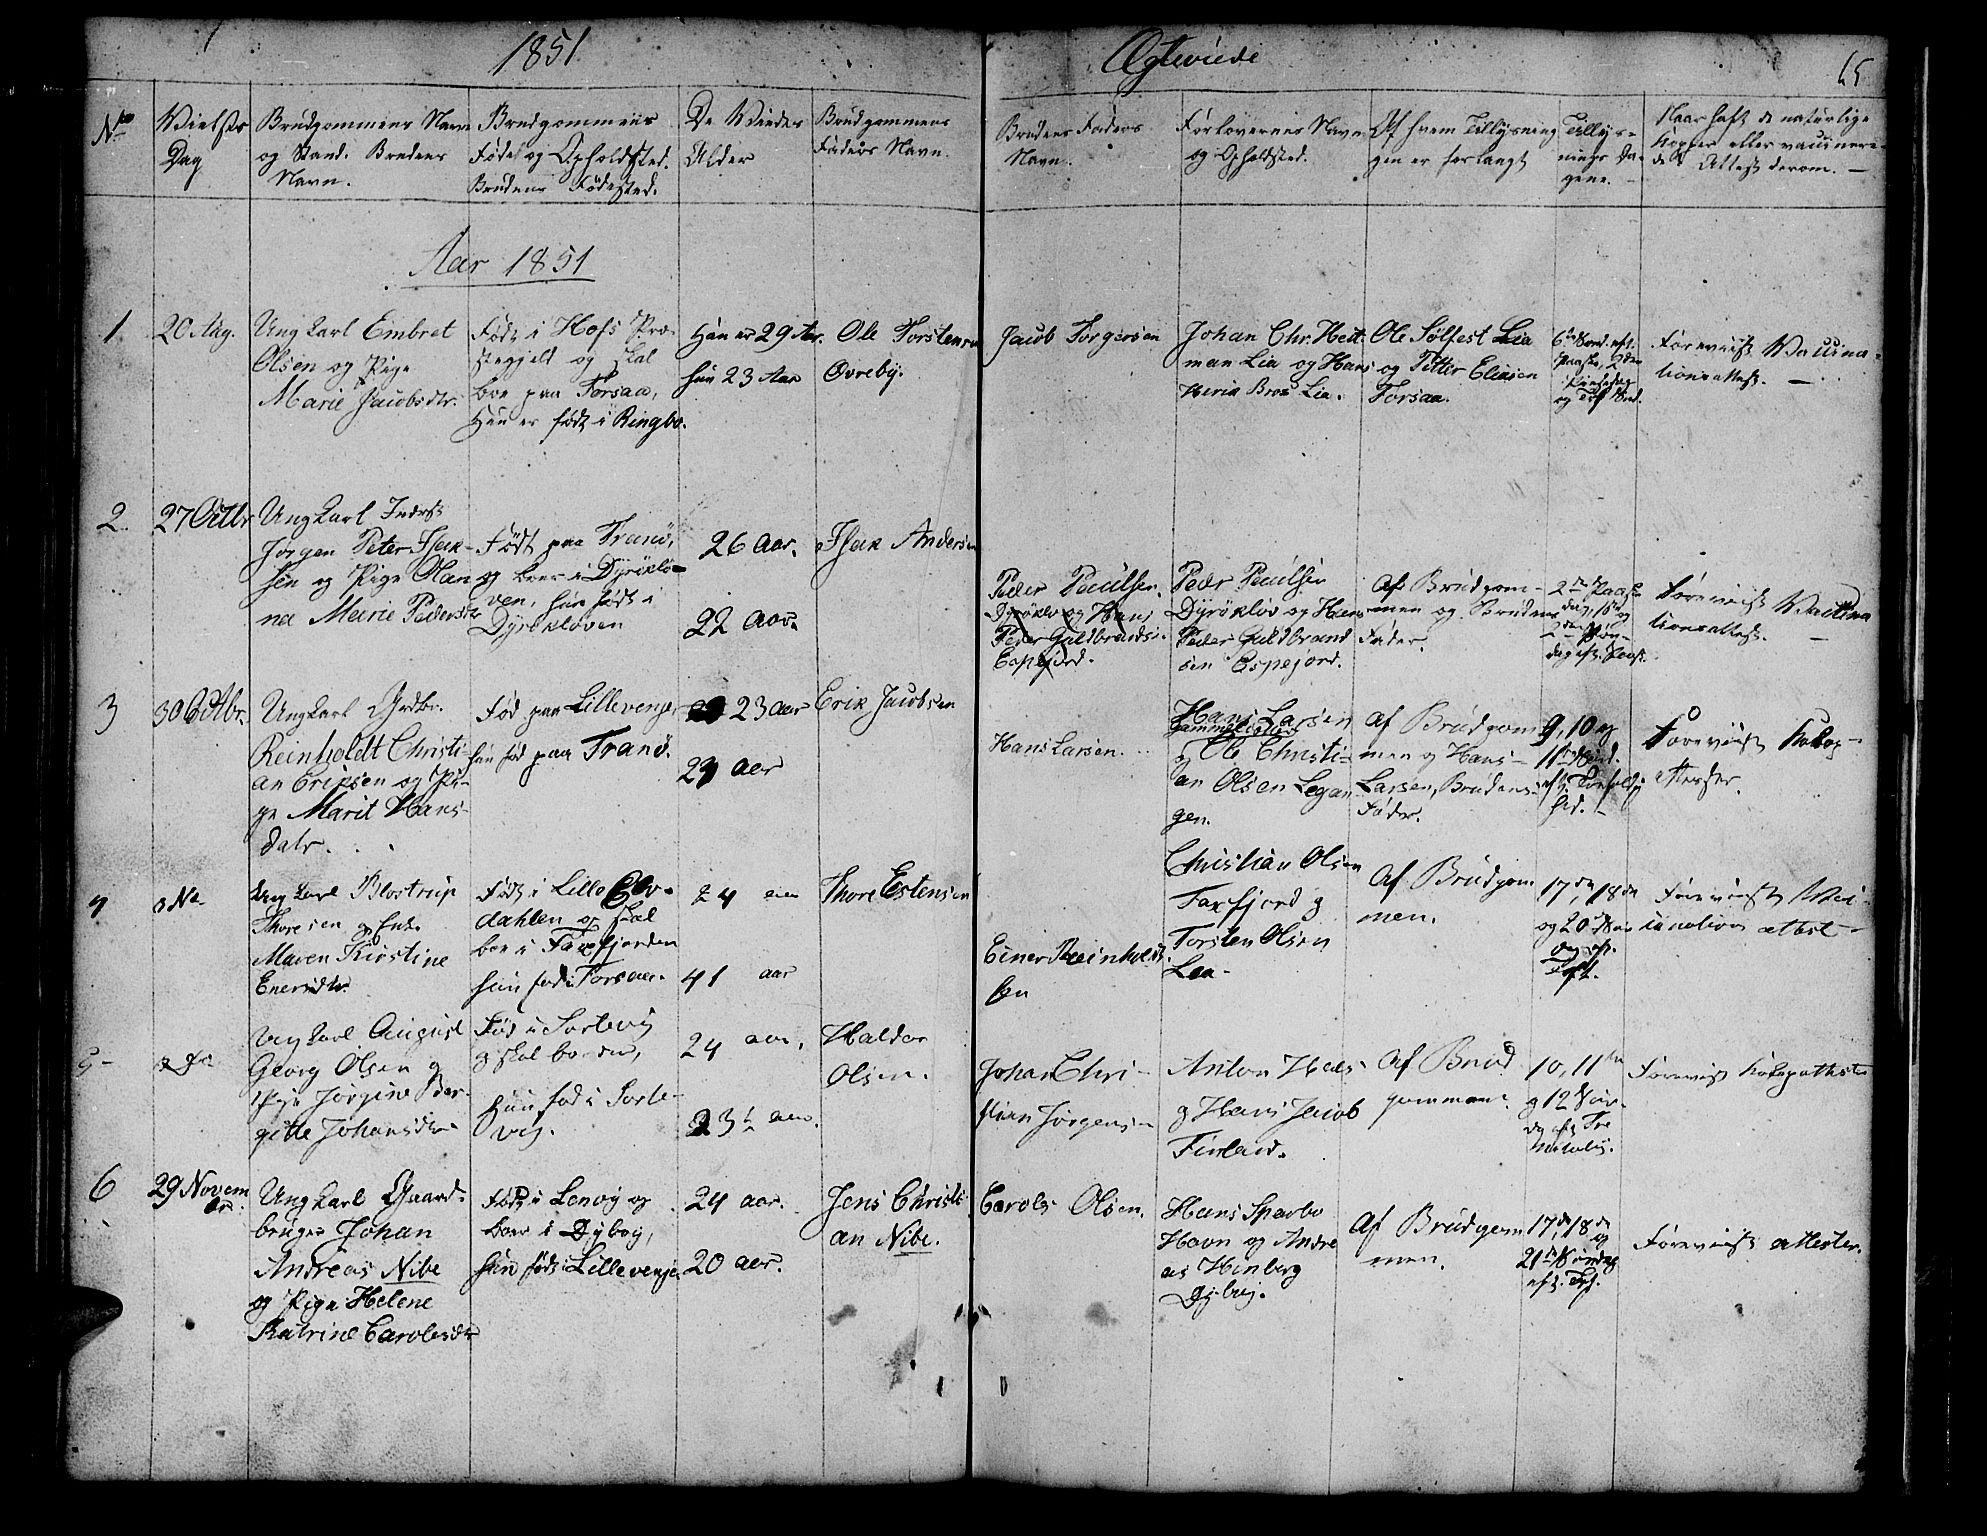 SATØ, Tranøy sokneprestkontor, I/Ia/Iab/L0011klokker: Klokkerbok nr. 11, 1845-1859, s. 65